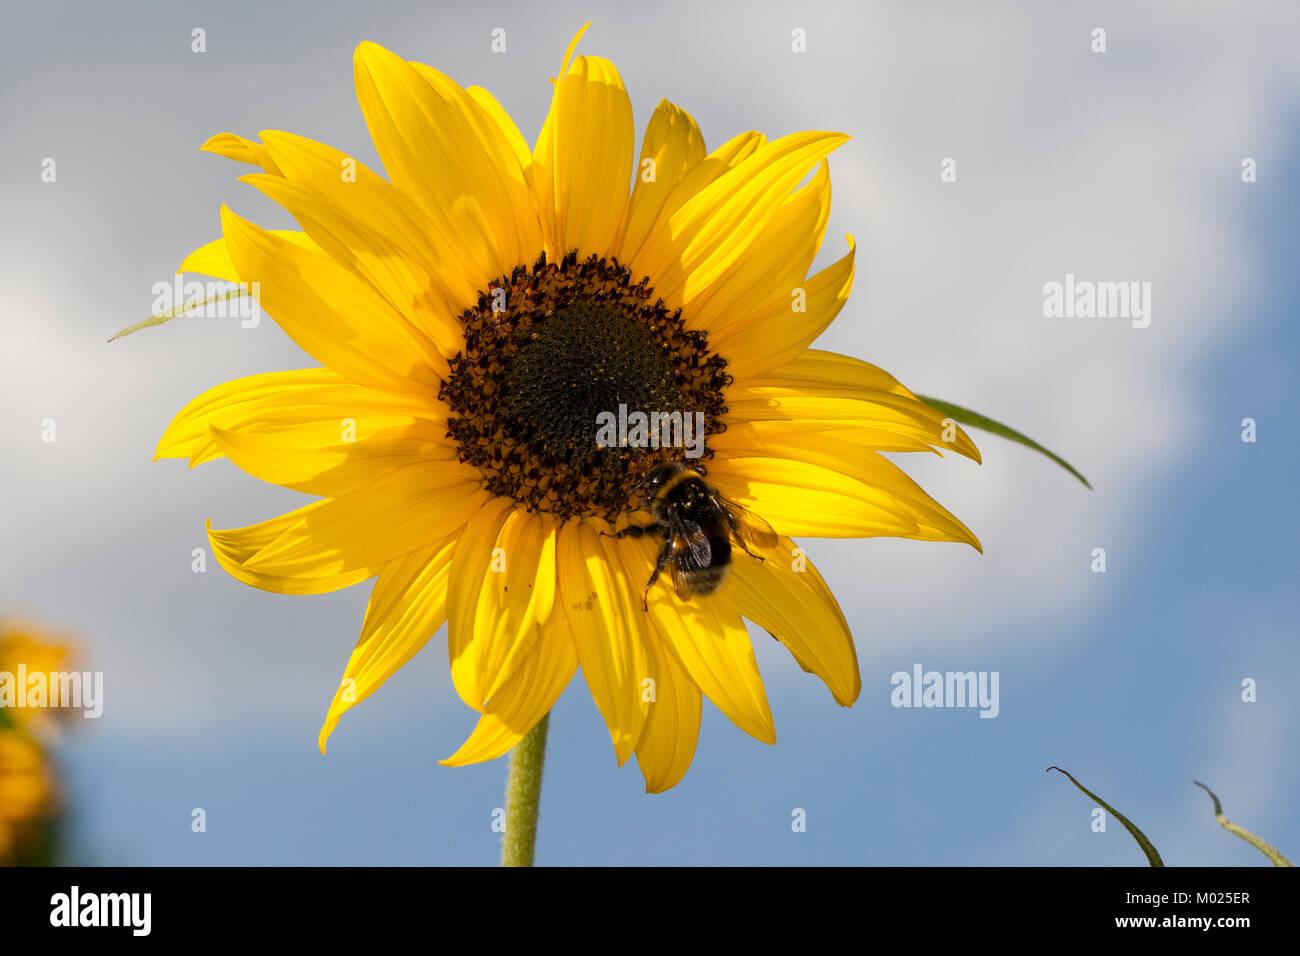 Sonnenblume, Helianthus annuus, Common Sunflower - Stock Image